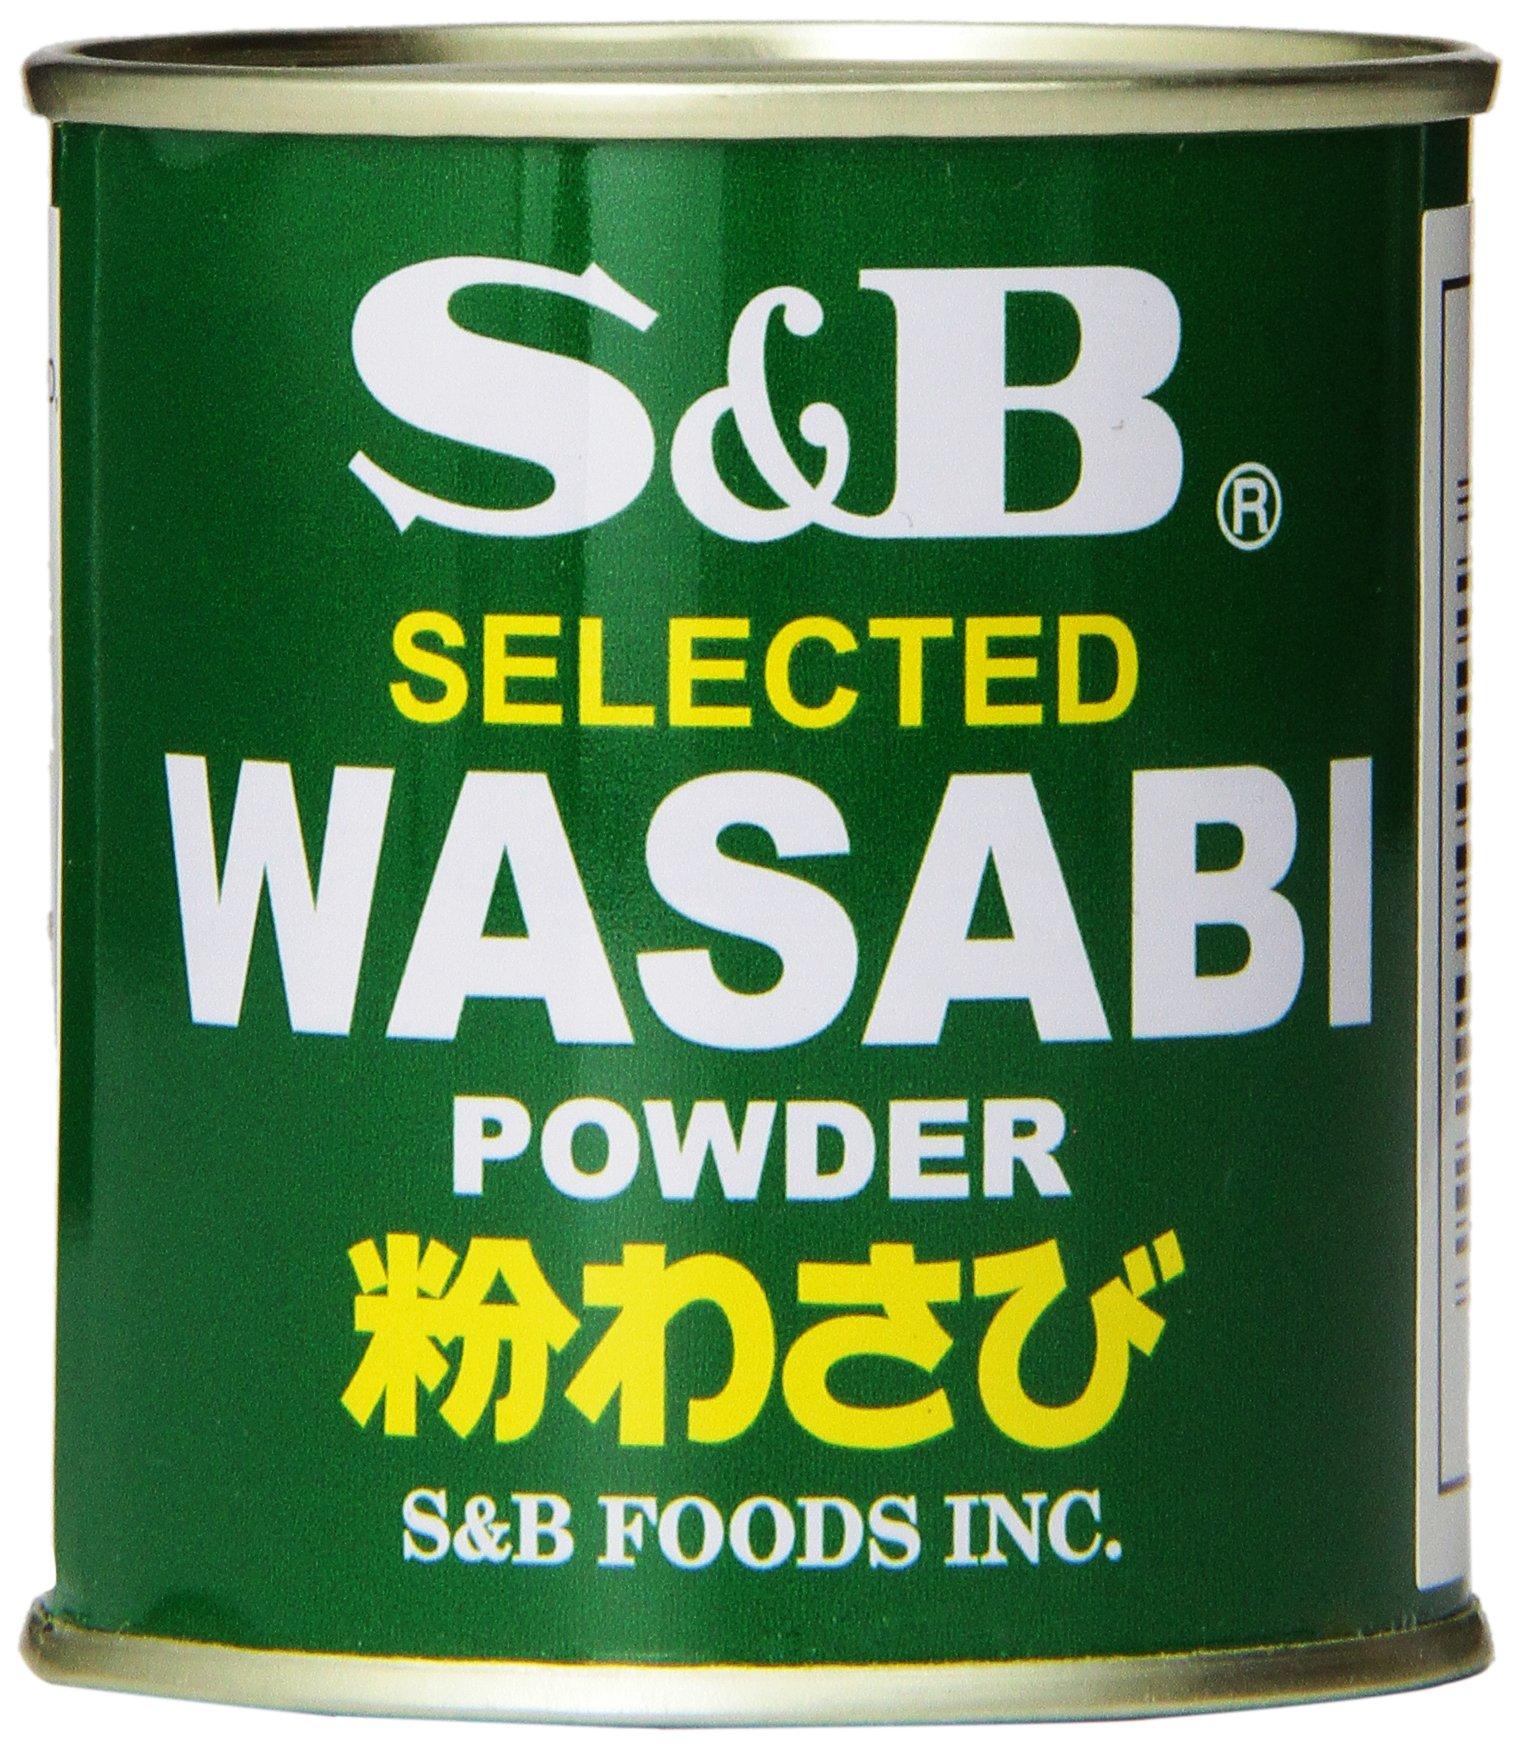 S&B Wasabi Powder, 1.06-Ounce by S&B